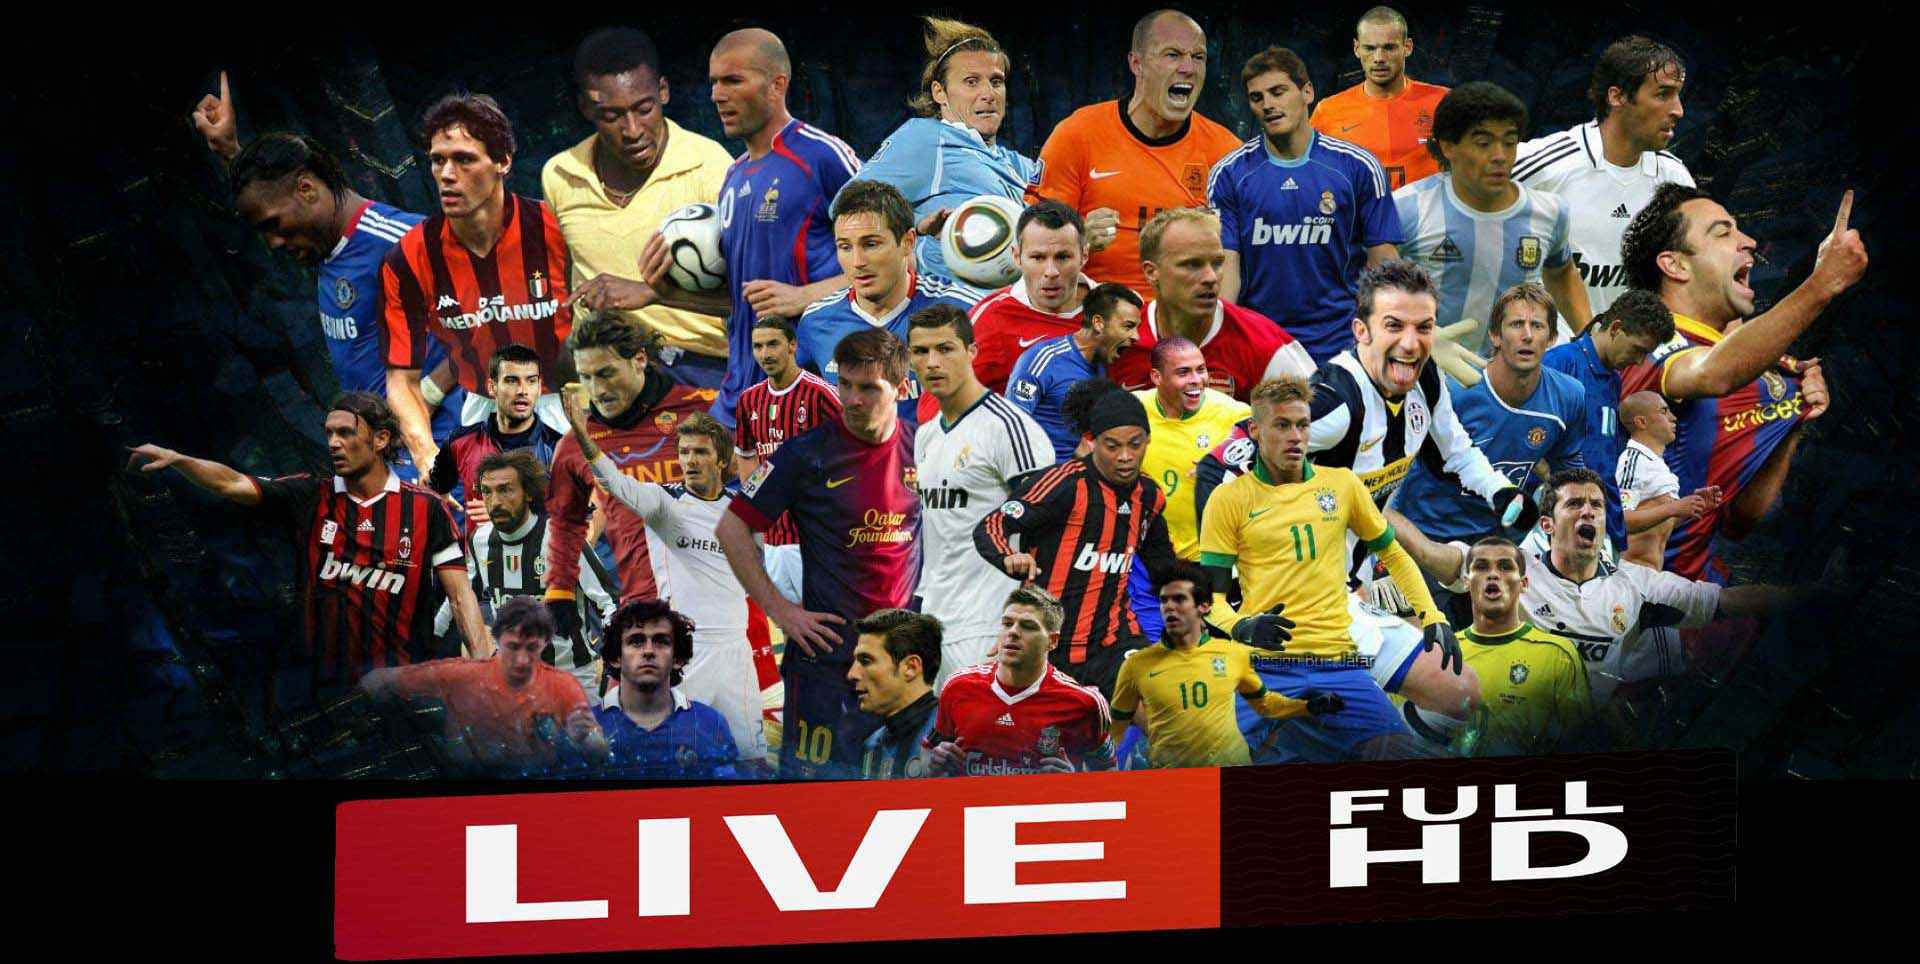 Legia Warsaw Vs Real Madrid live